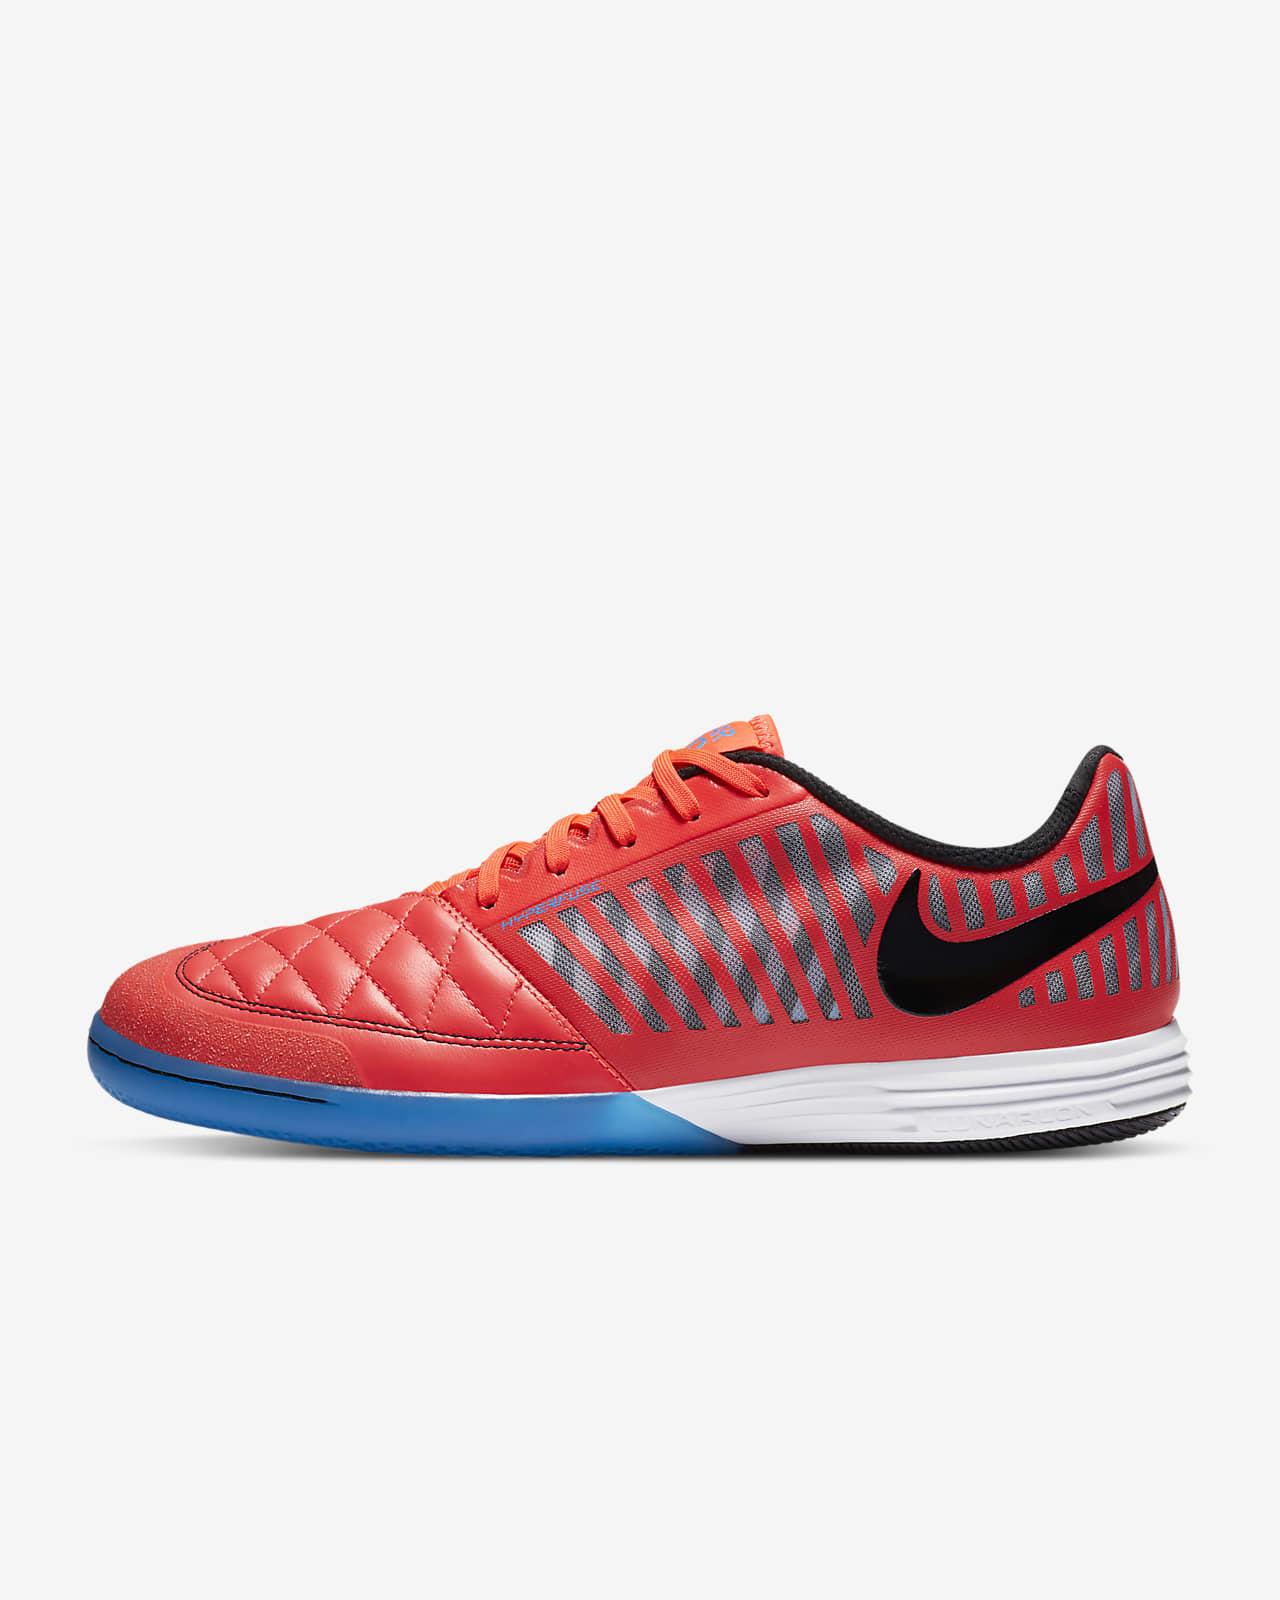 Nike Lunar Gato II IC Indoor/Court